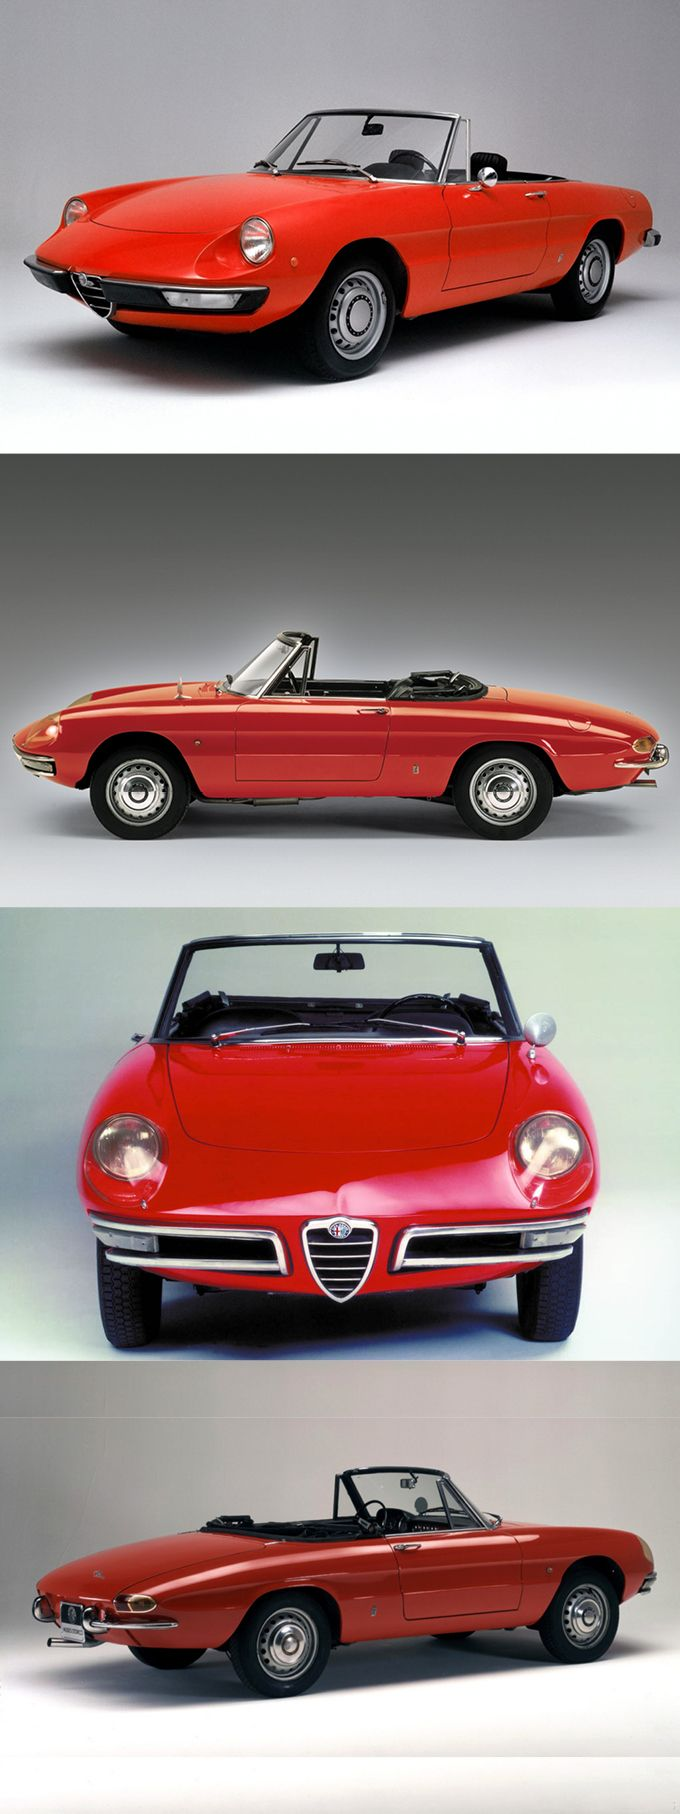 1966 Alfa Romeo Spider Duetto / boattail / Italy / red / Pininfarina / 17-332